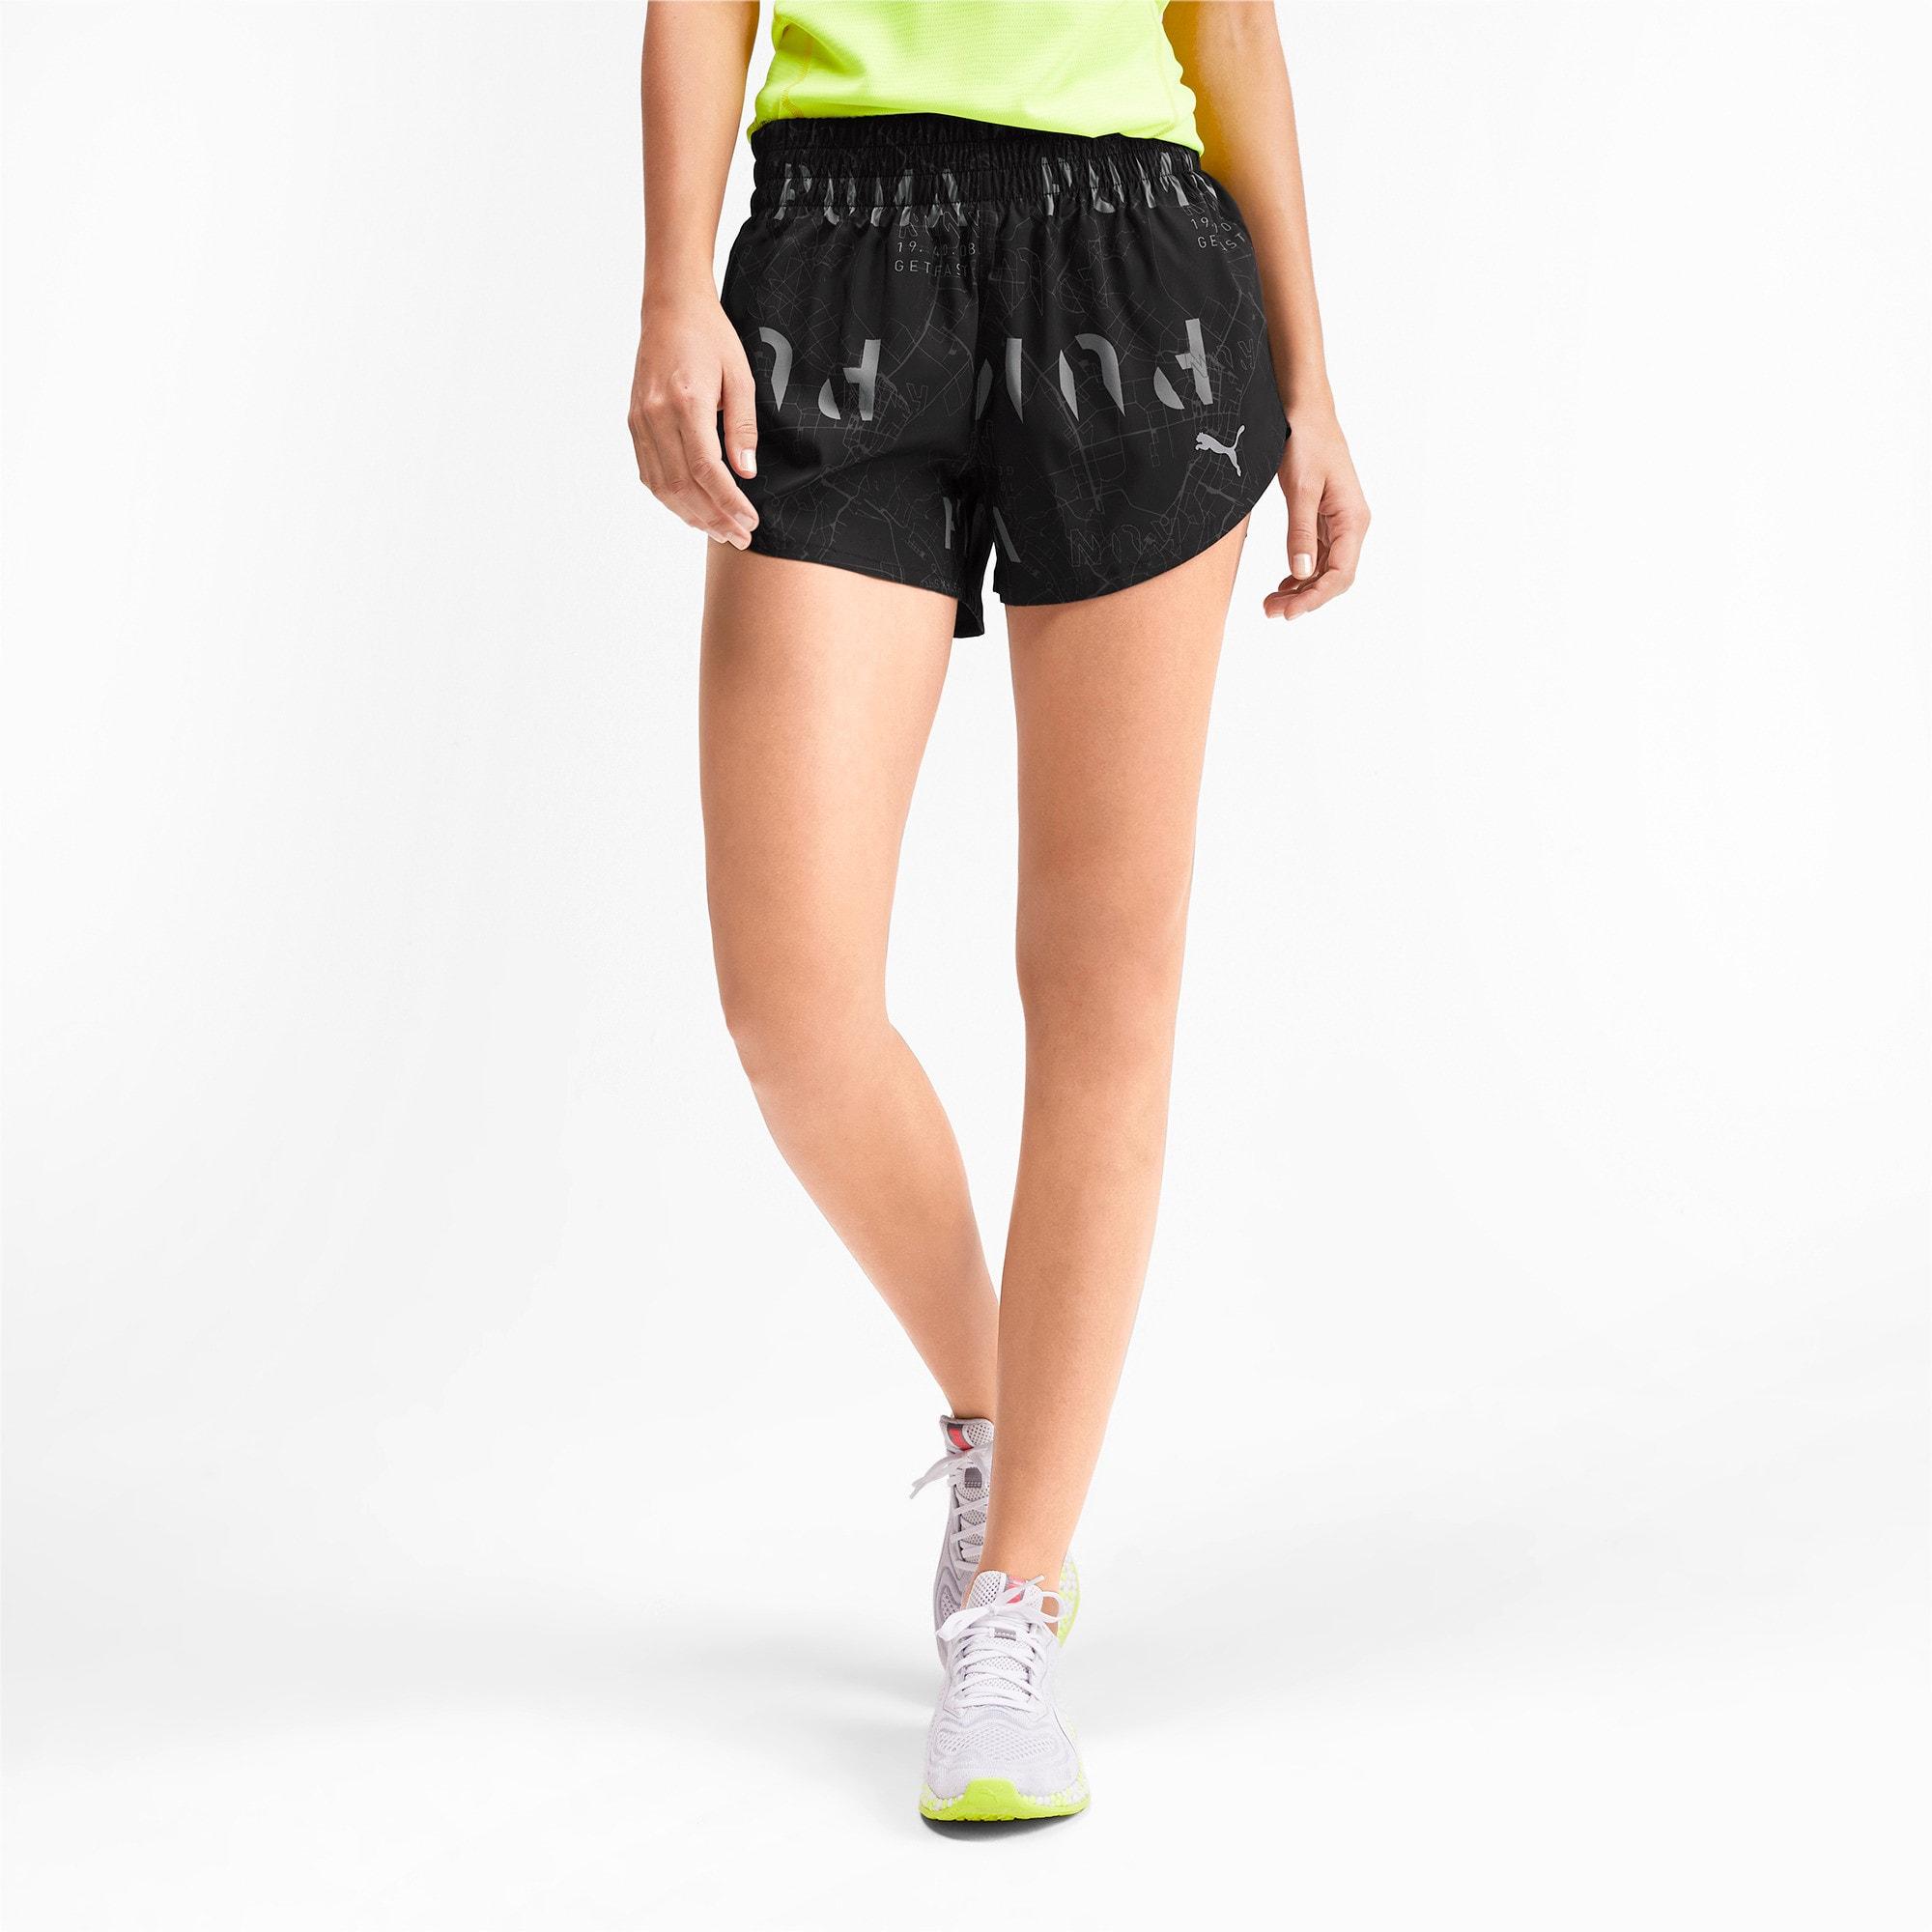 "Thumbnail 1 of 3"" Graphic Women's Shorts, Puma Black-Reflective Print, medium"